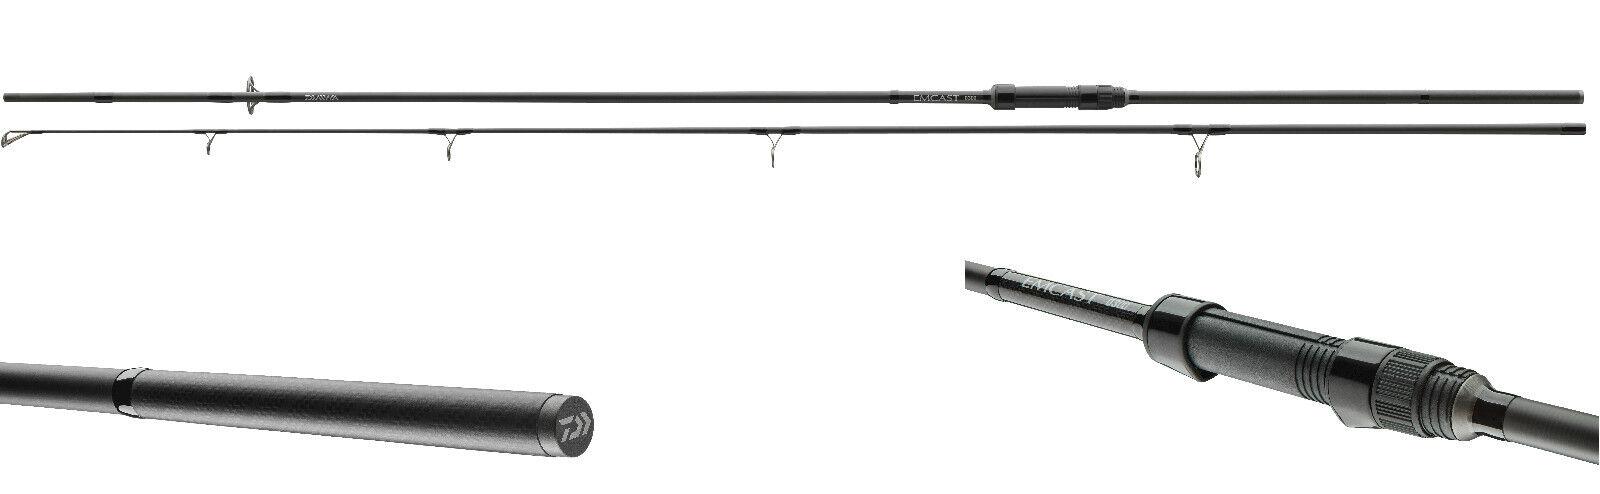 Daiwa Emcast Carp 3 60m 3 0 lbs Karpfenrute 2-teilig Karpfenangel Karpfen Rute